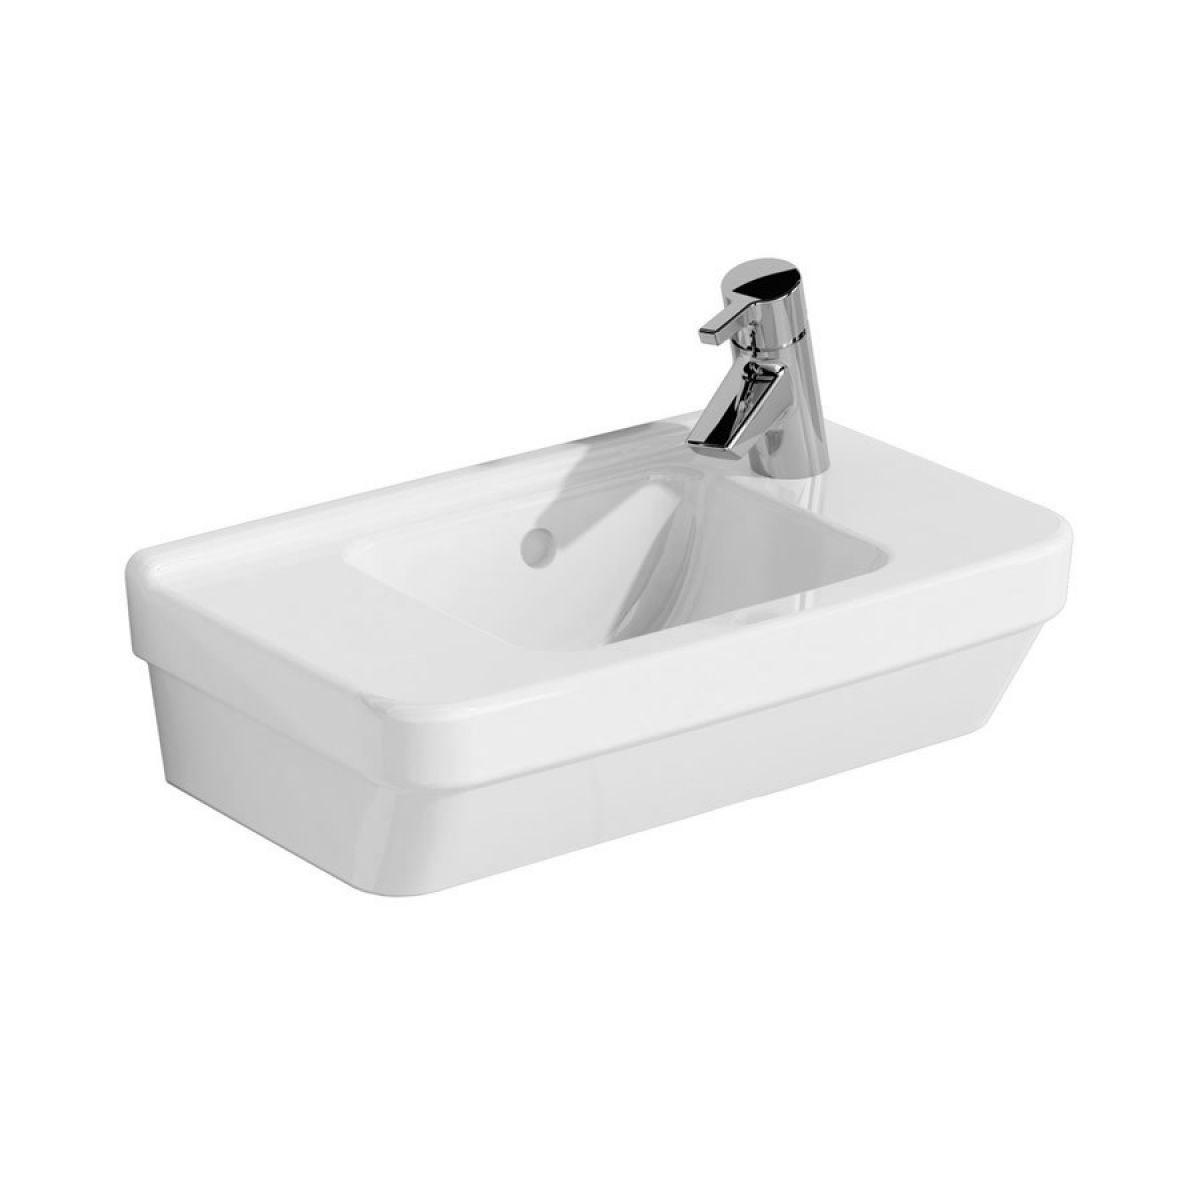 Small Cloakroom Sink : Home Bathroom Basins Wash Basins